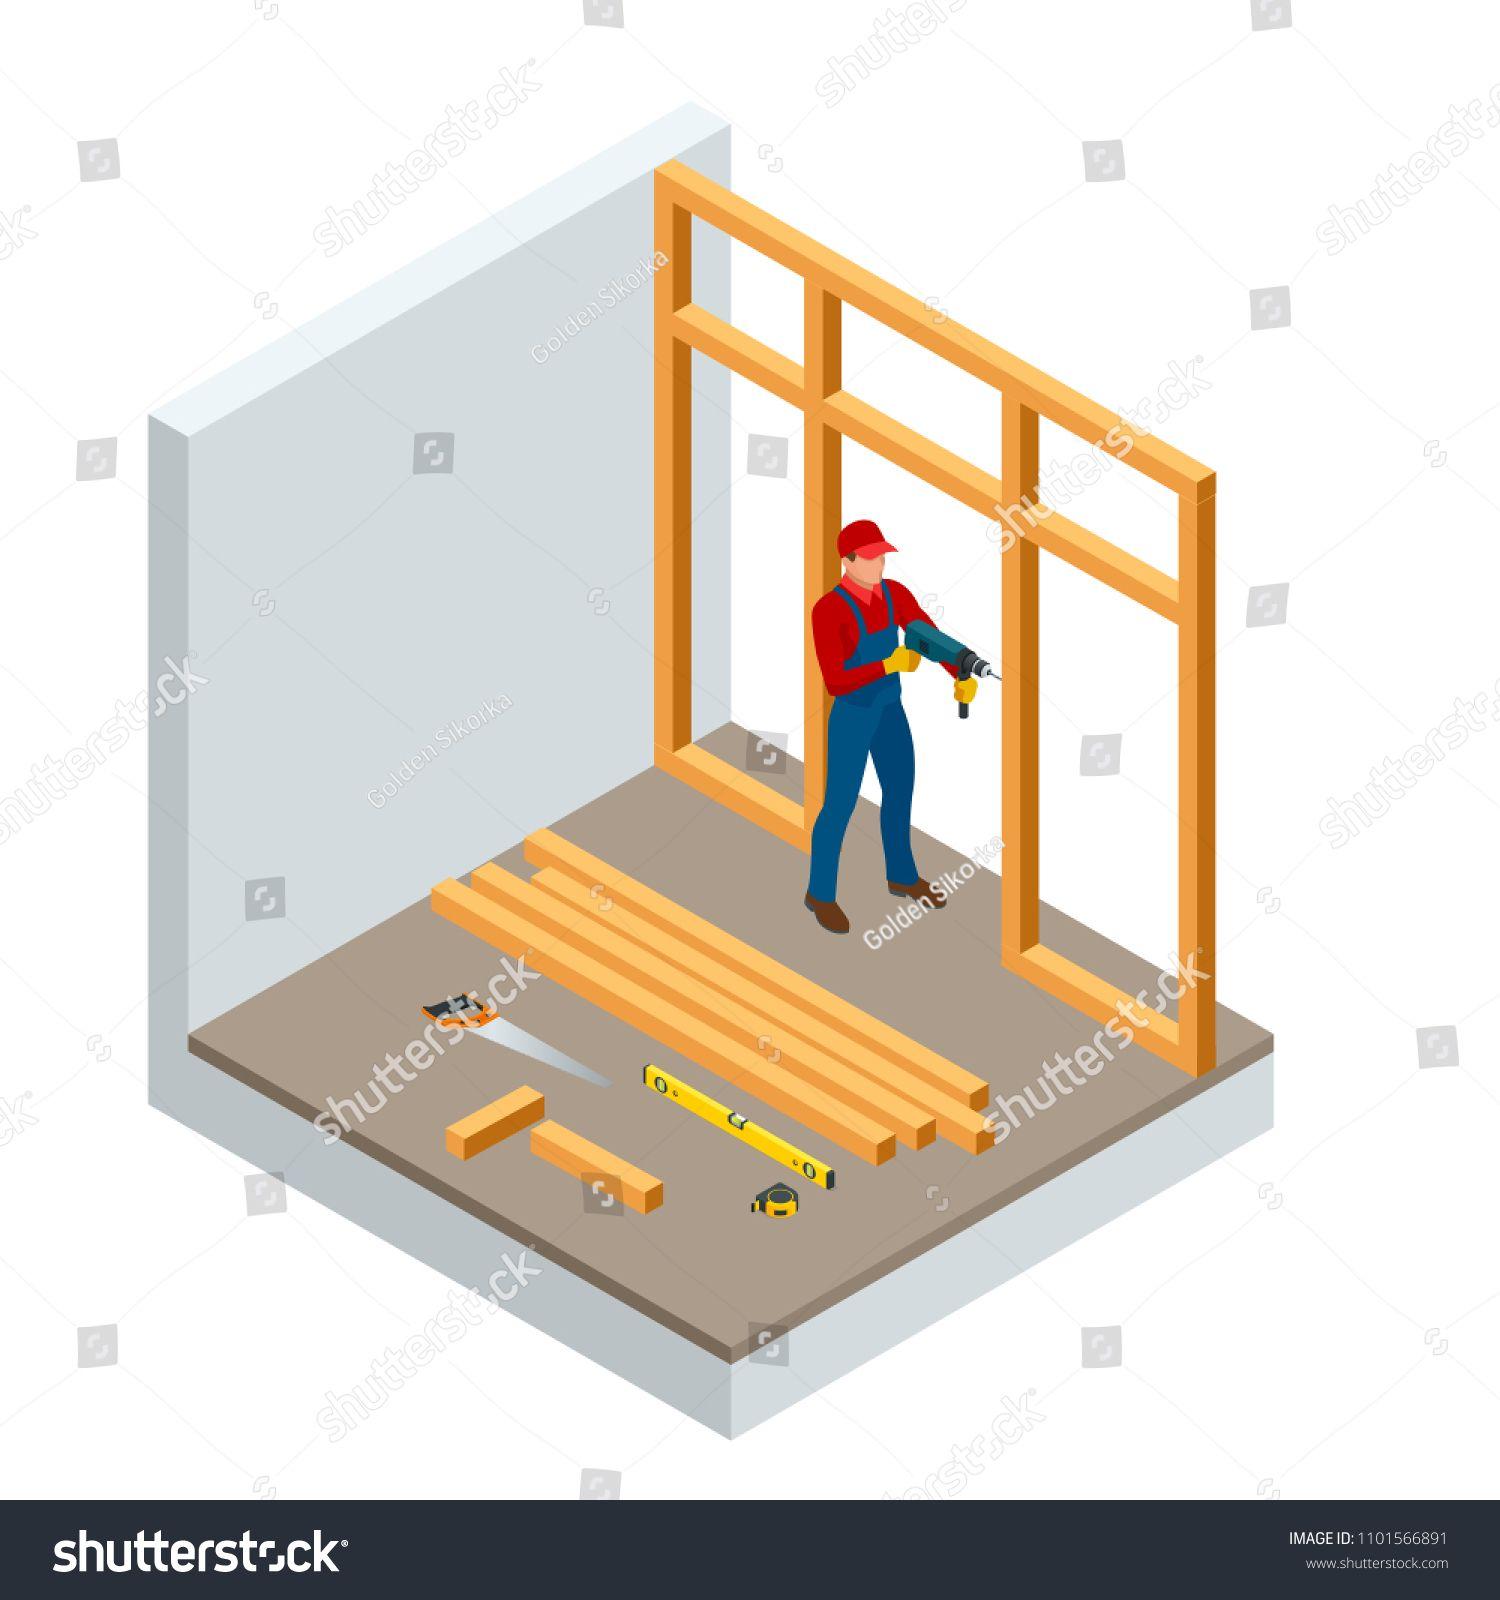 Isometric professional carpenters drilling wood